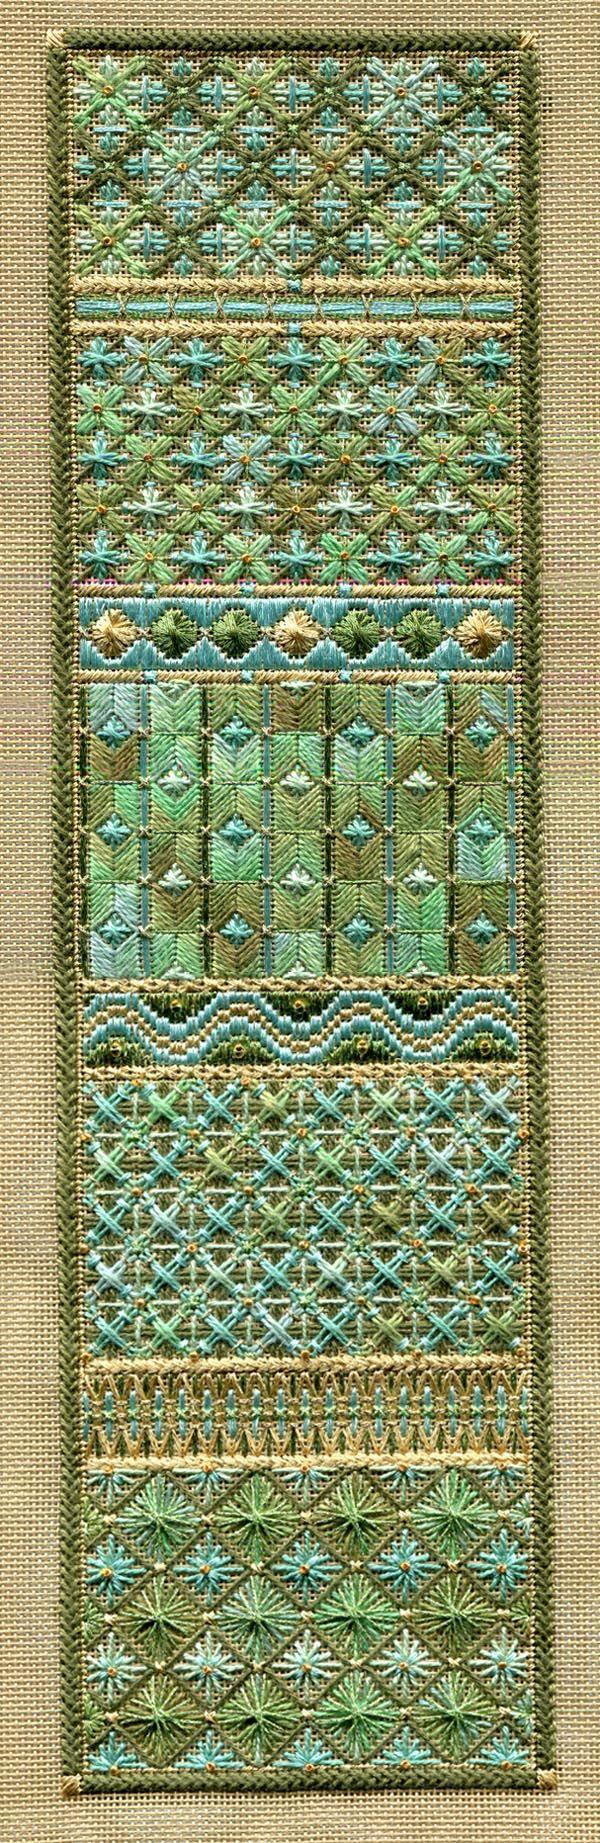 One Long Panel Laura Perin design